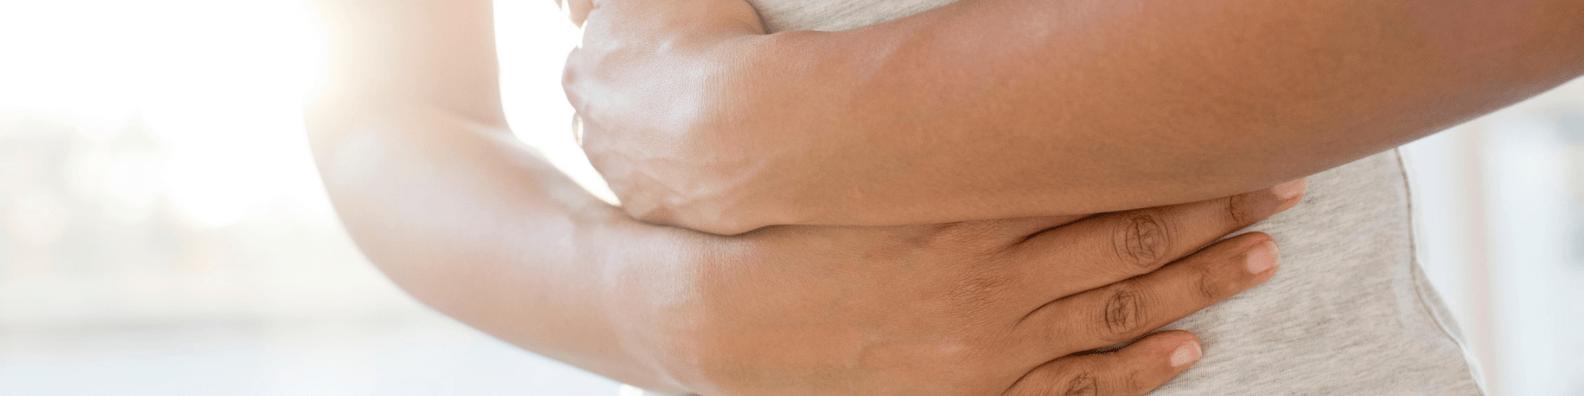 Healing endometriosis